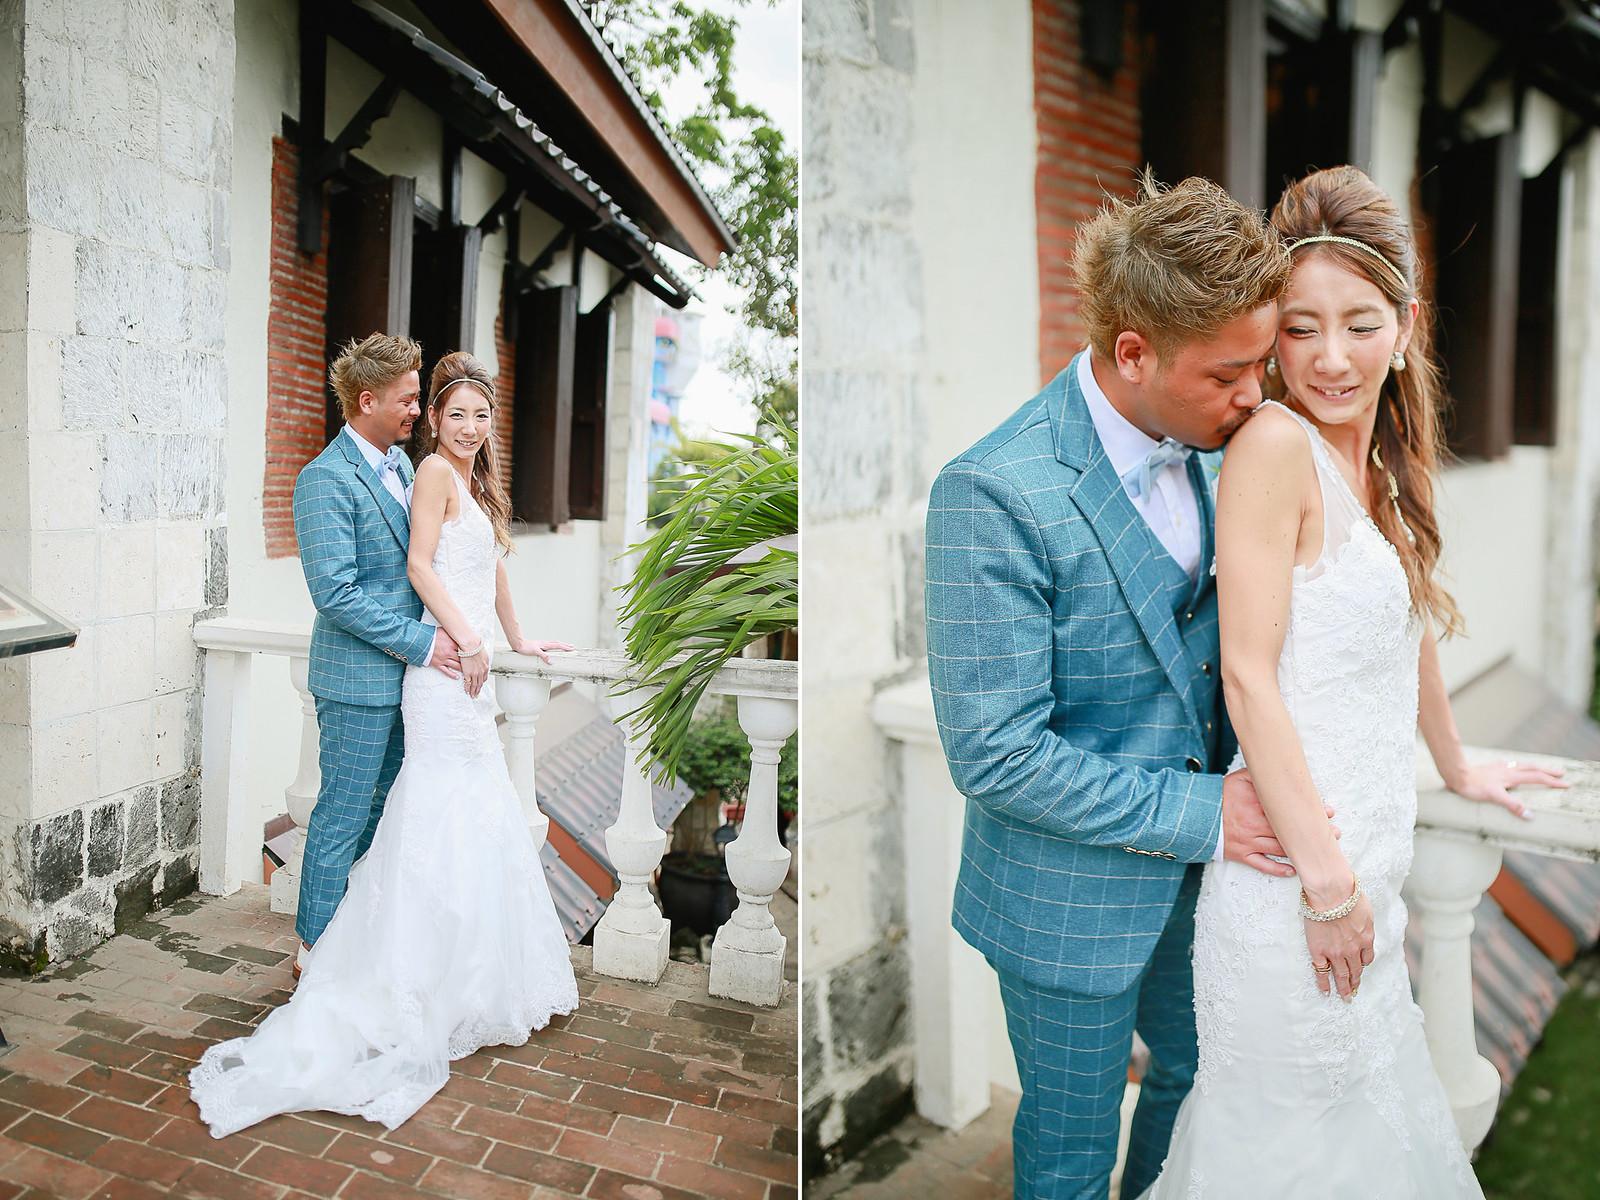 Cebu Fort San Pedro, Pre-Wedding Photographer Cebu